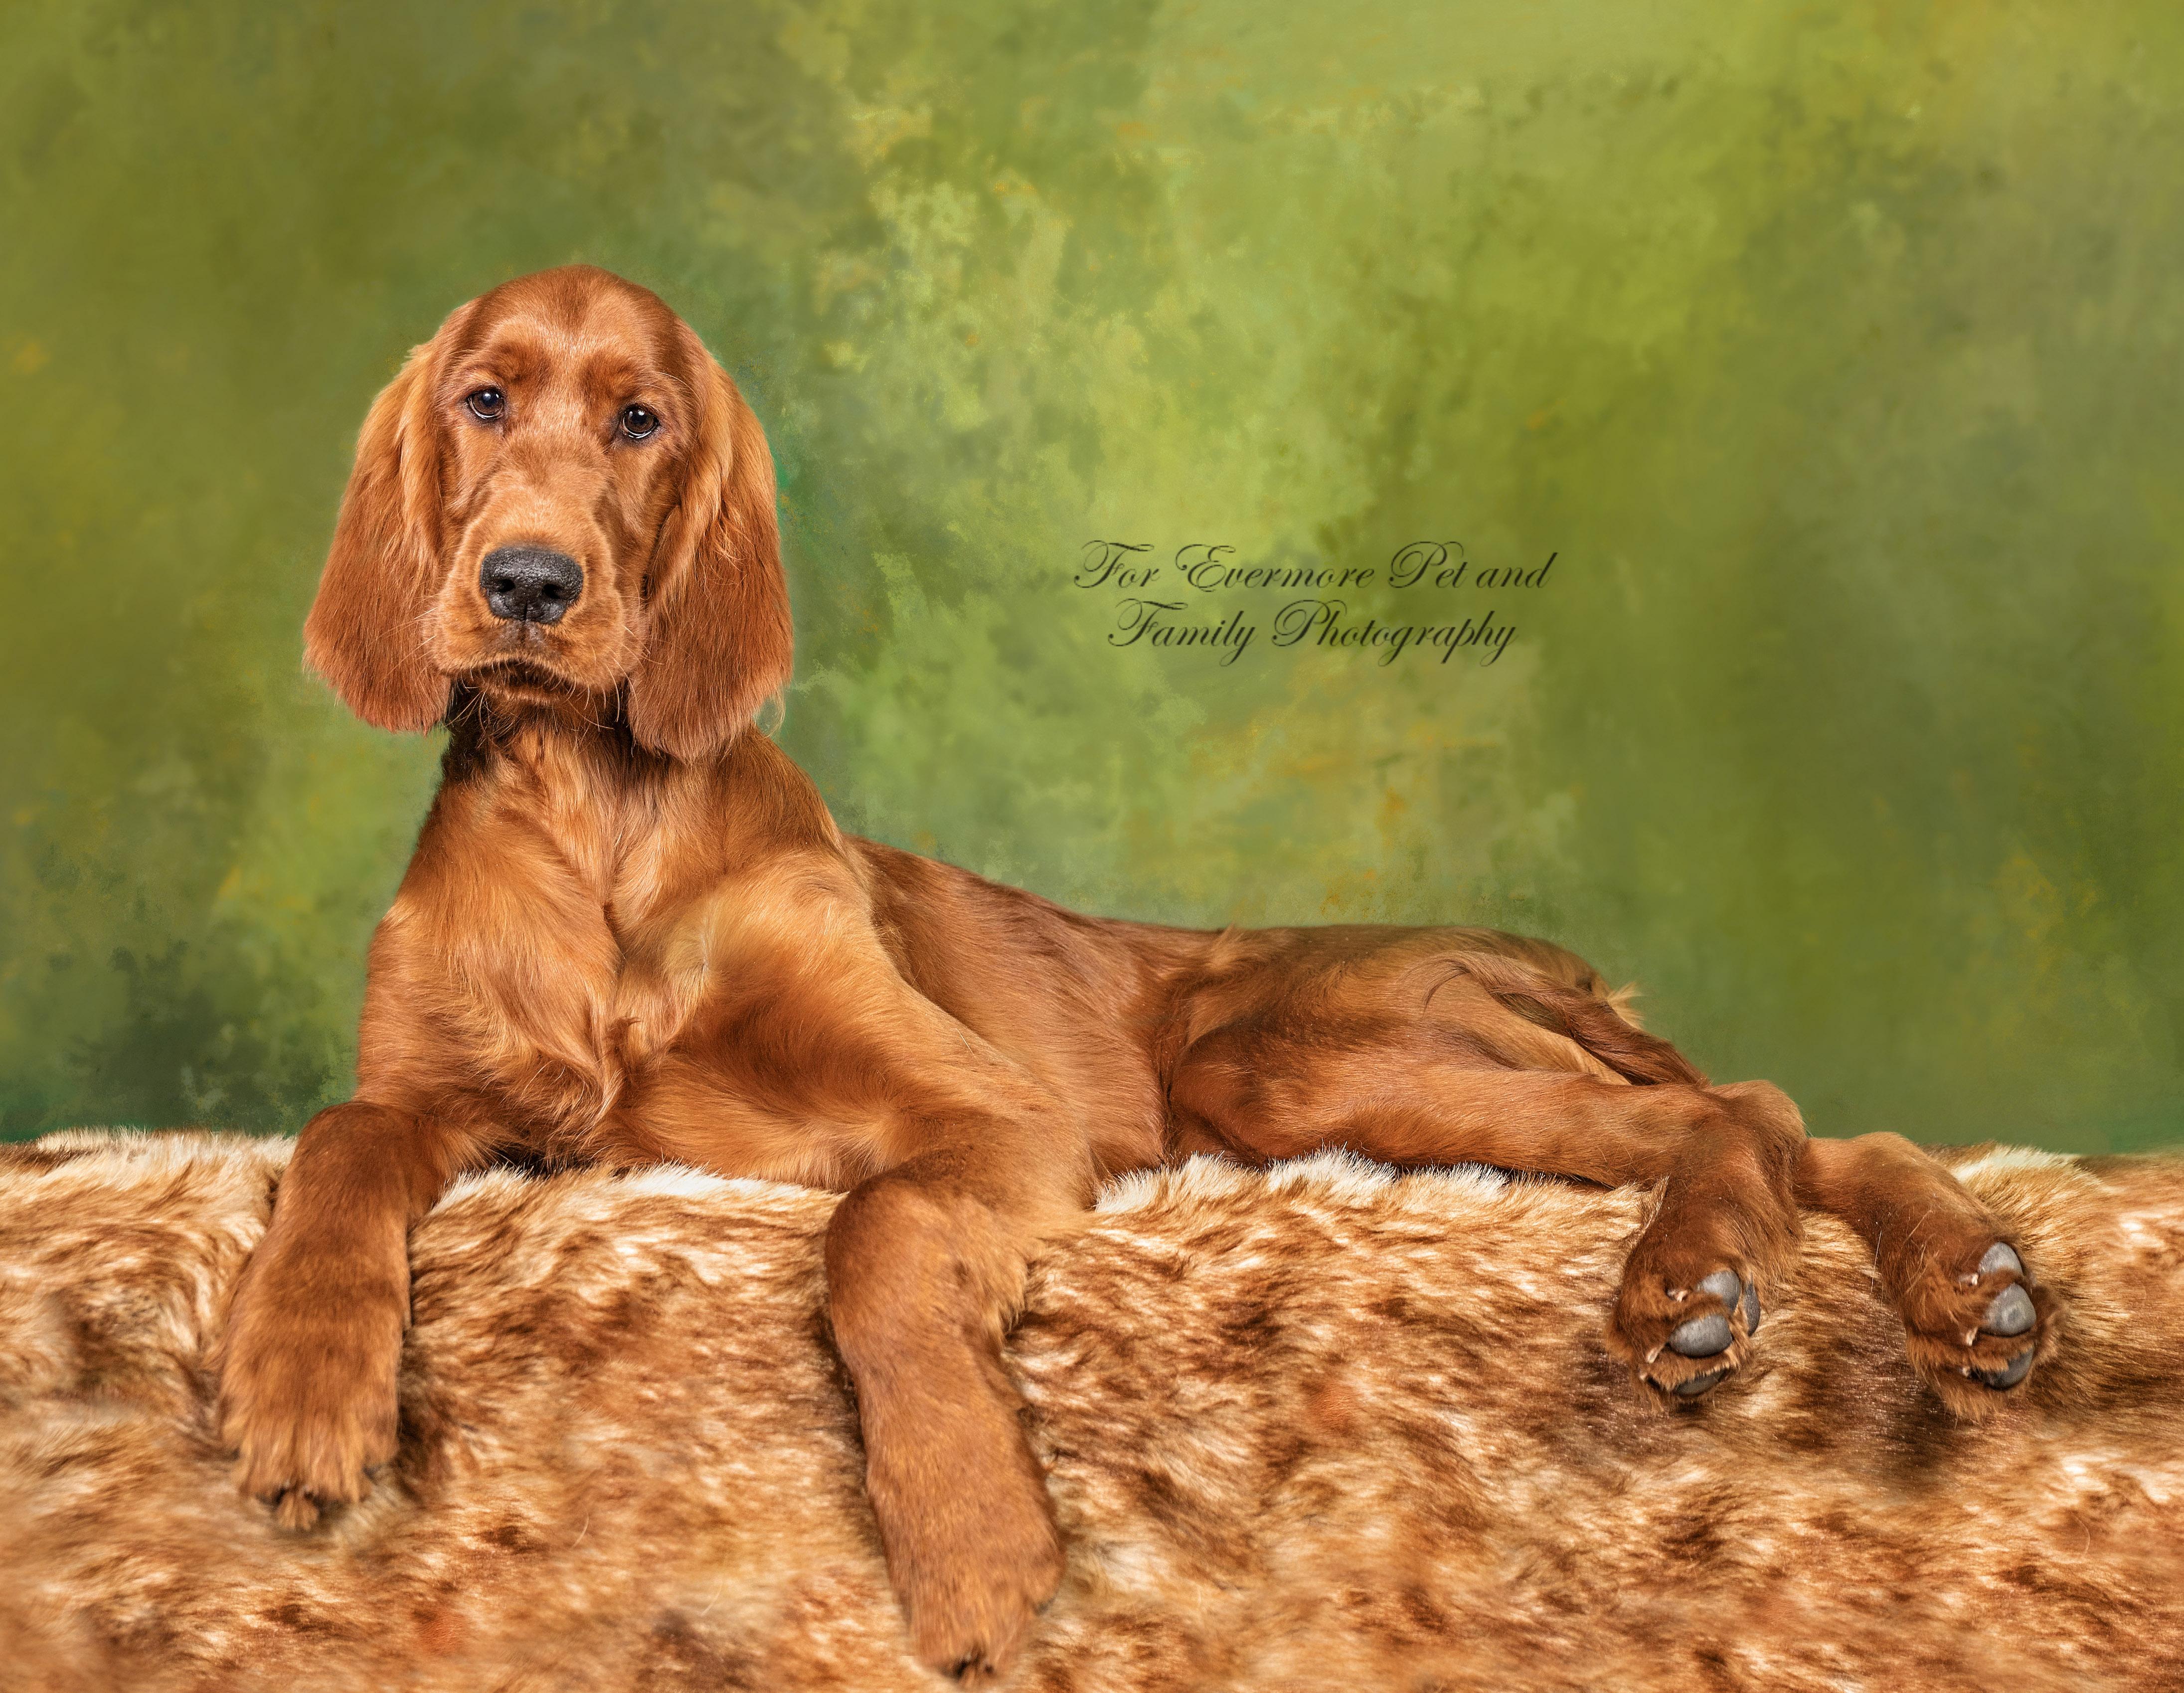 Irish Setter puppy August